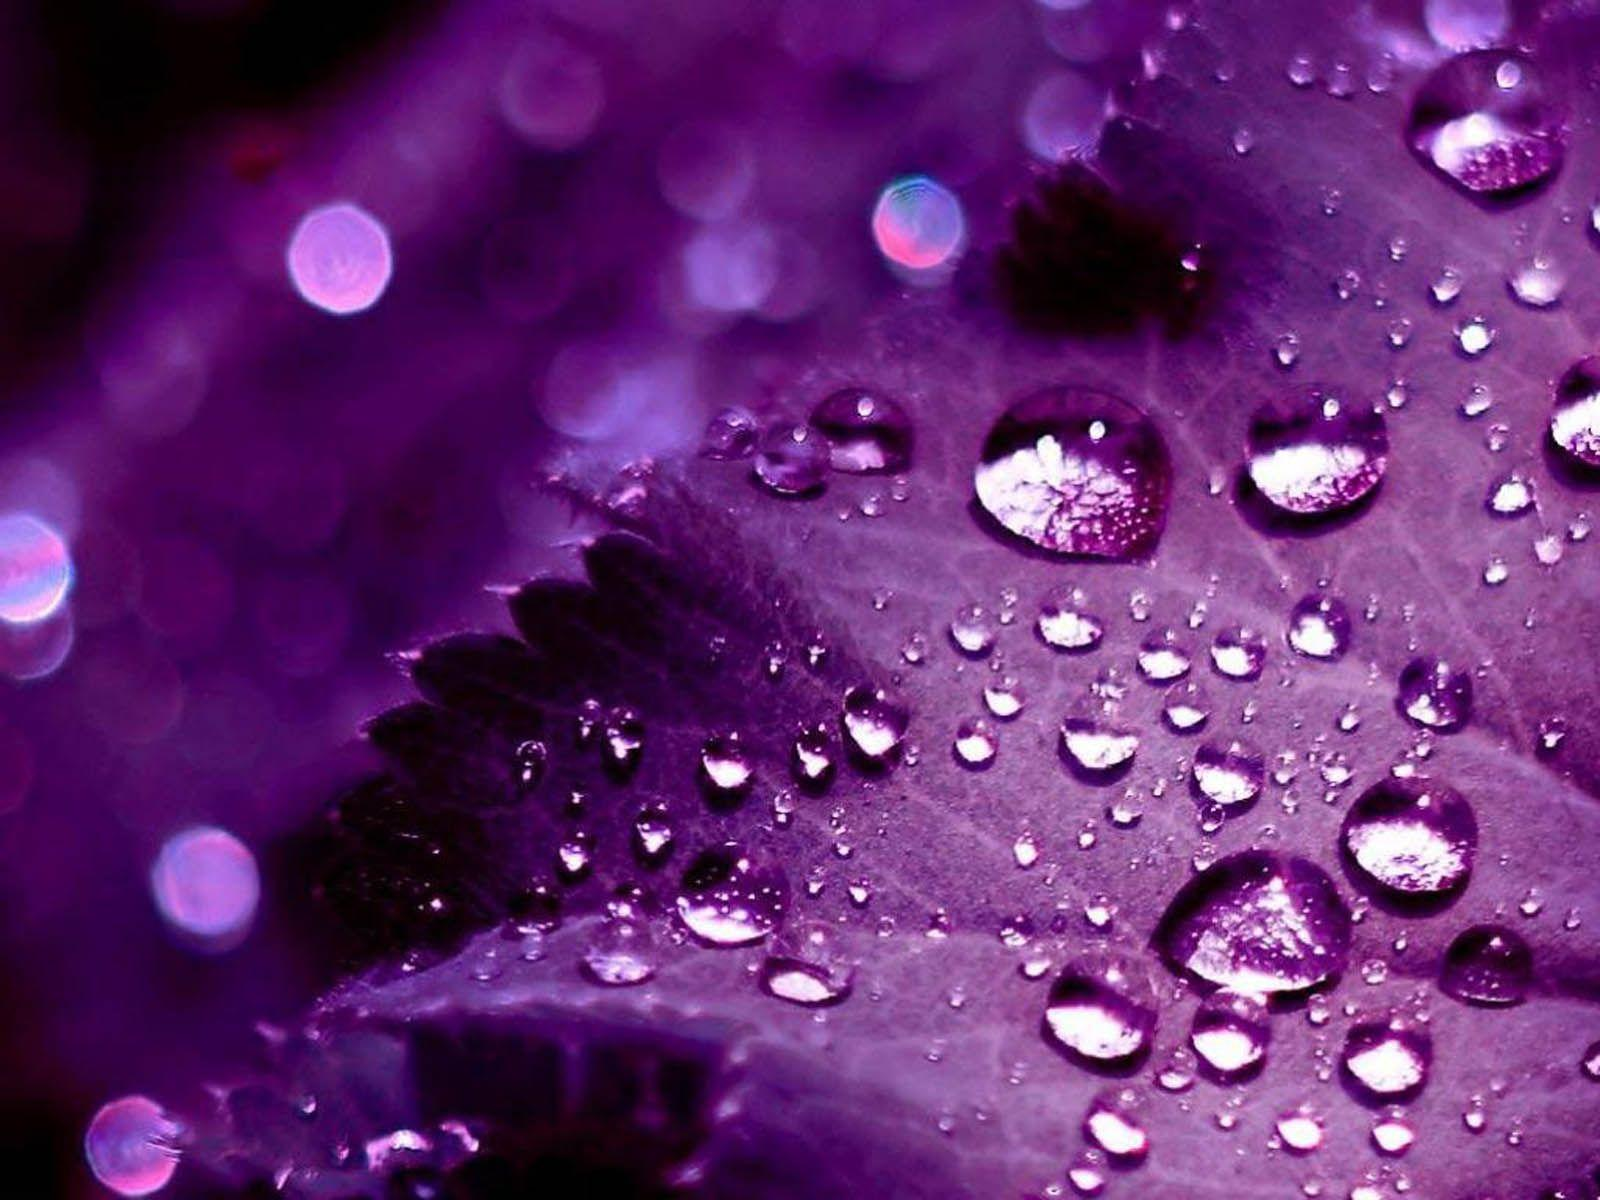 purple spidey computer wallpapers - photo #1